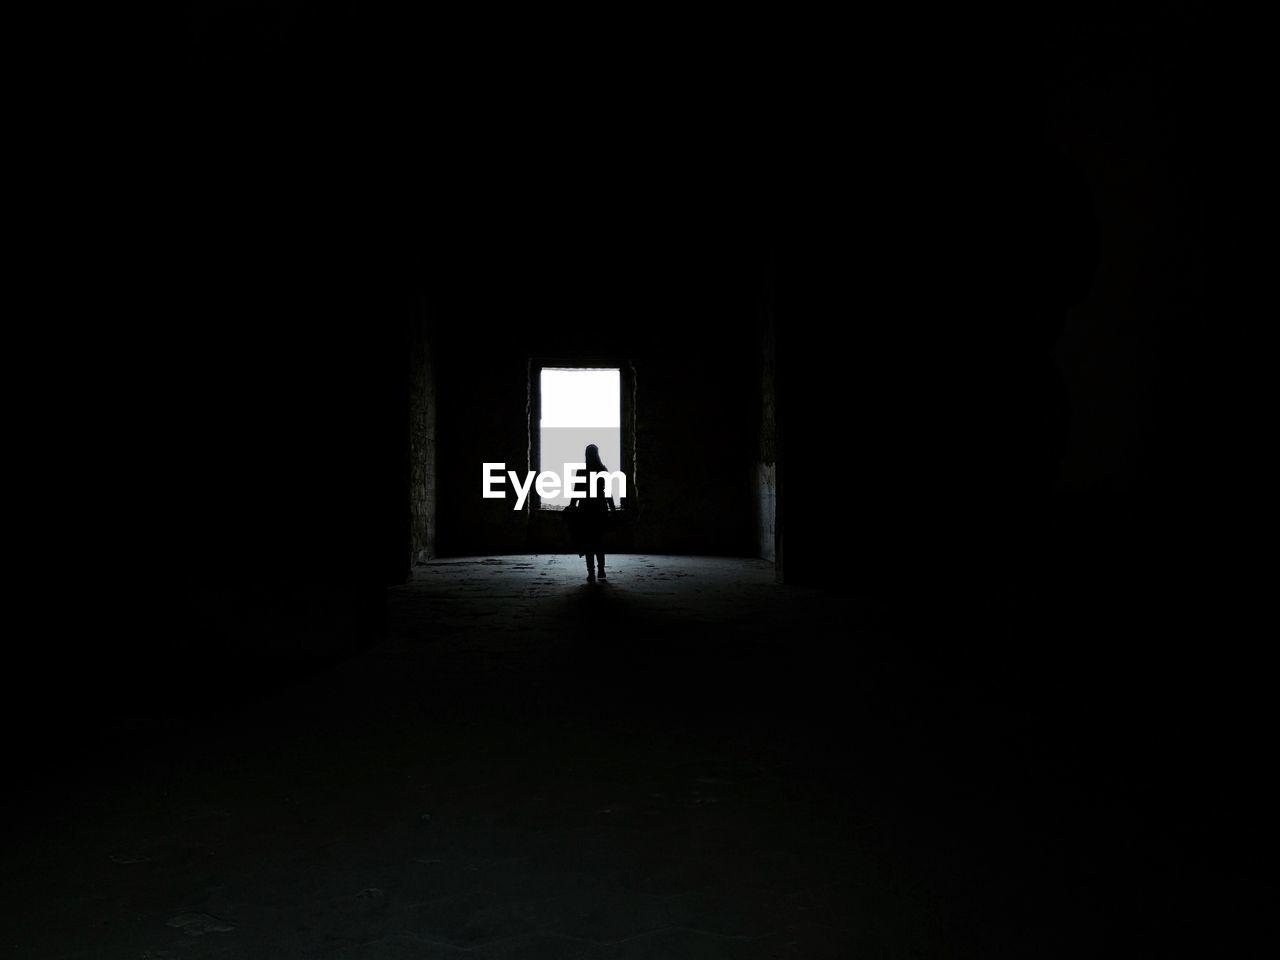 Silhouette woman walking towards light in old building